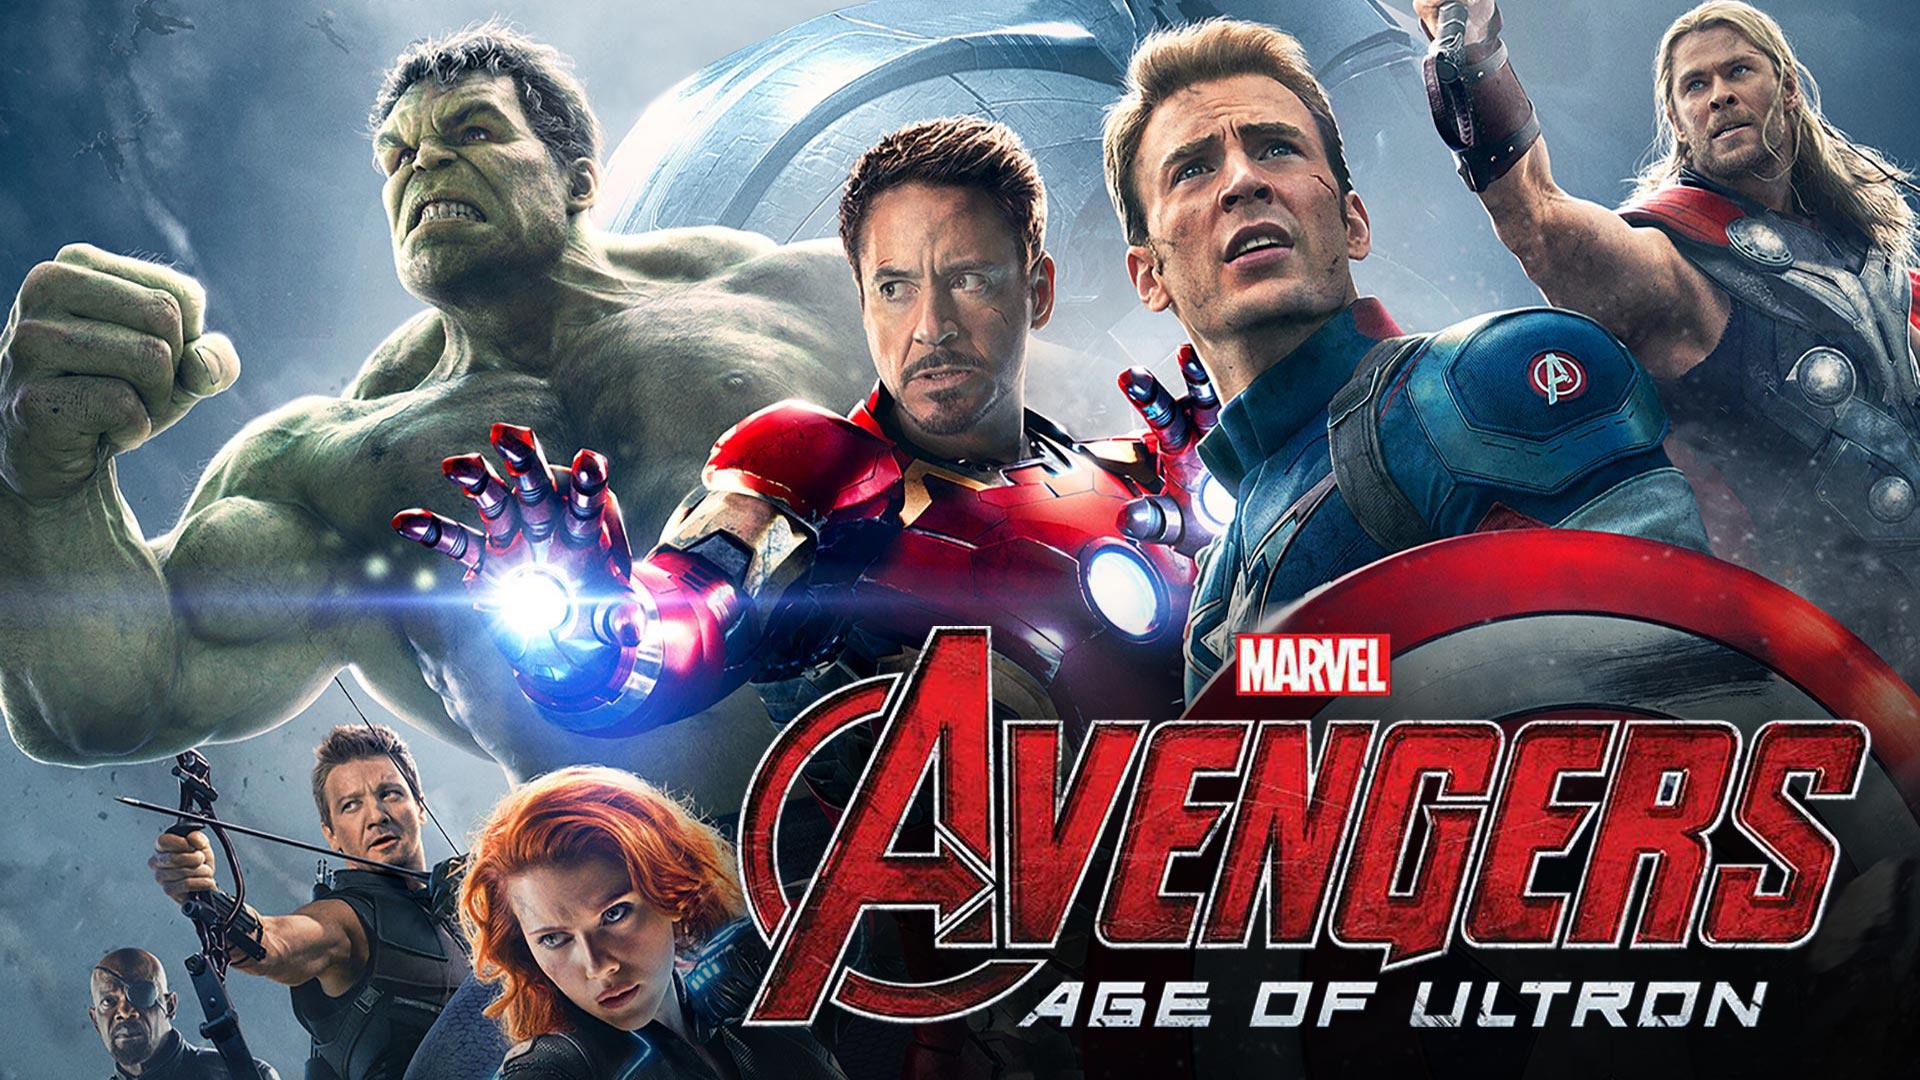 Marvel Studios' Avengers: Age of Ultron (4K UHD)